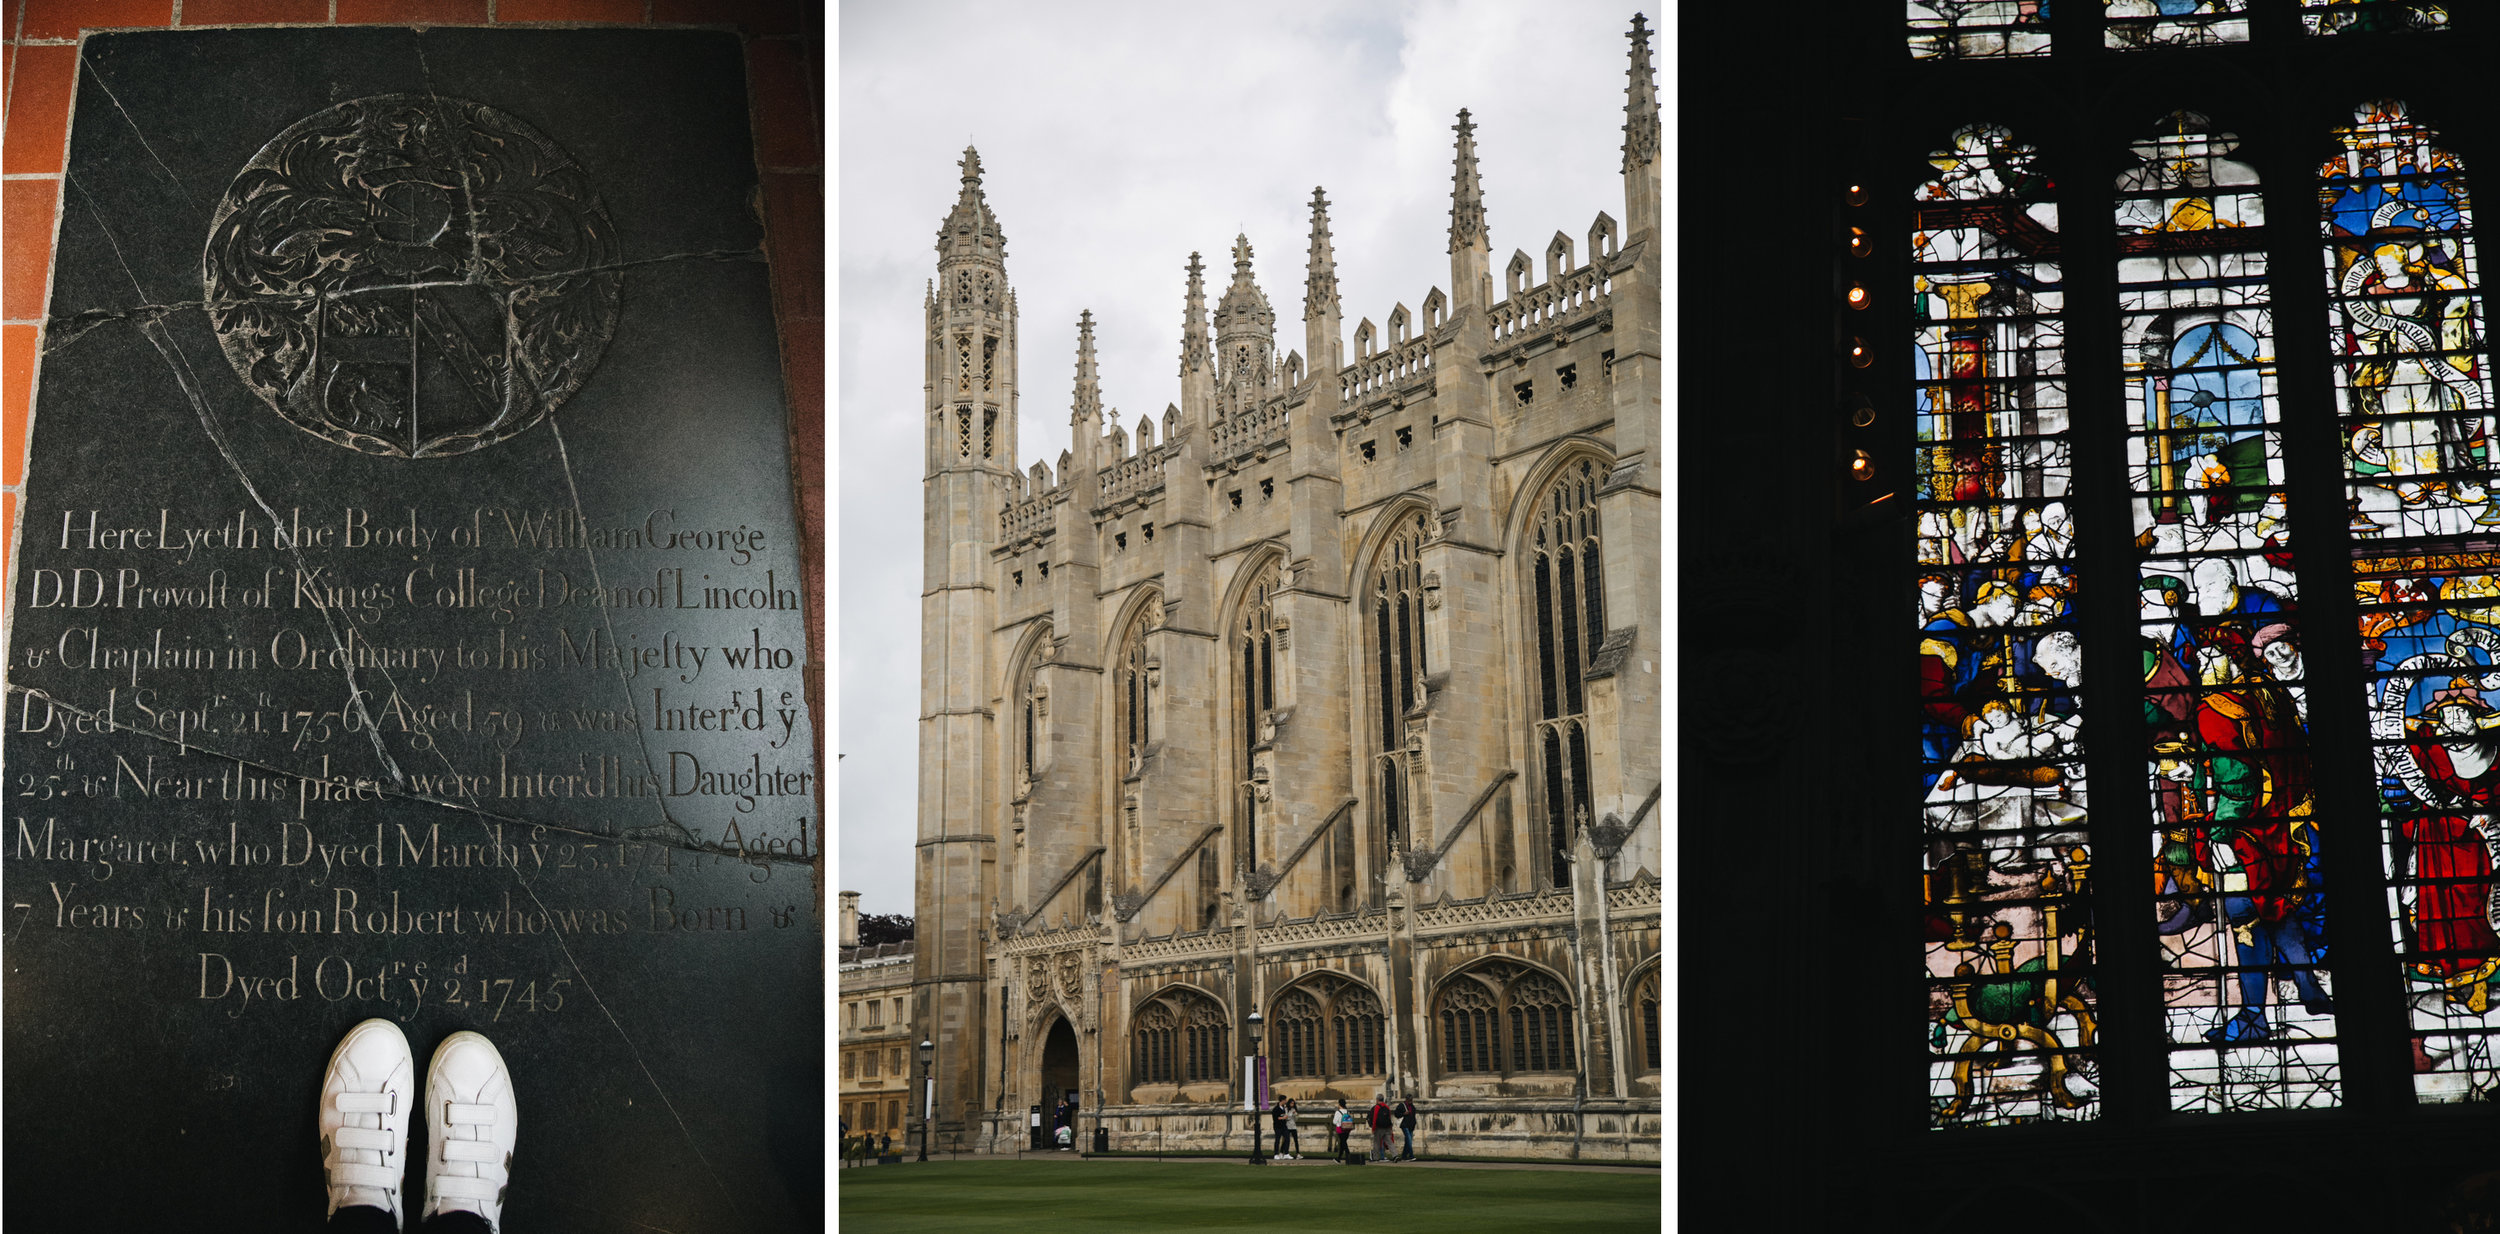 kings-college-chapelle-cambridge-universite.jpg